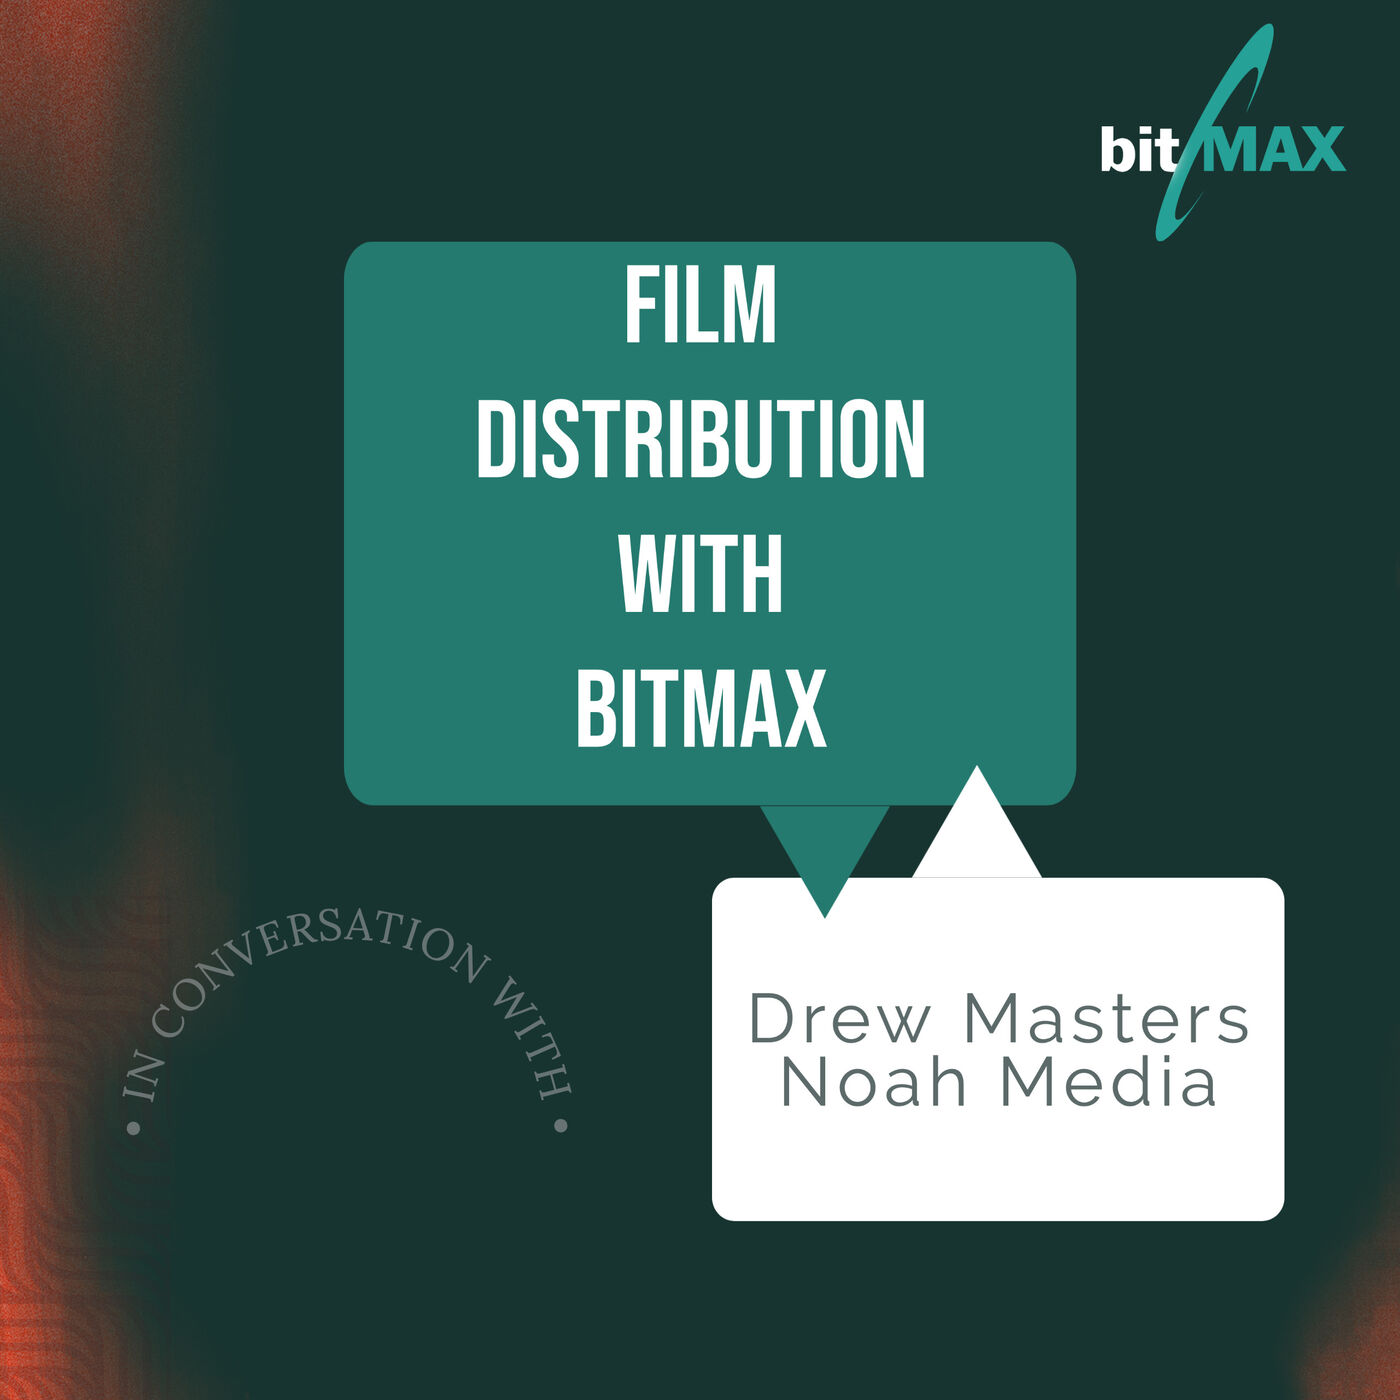 Episode 8: Drew Masters from Noah Media